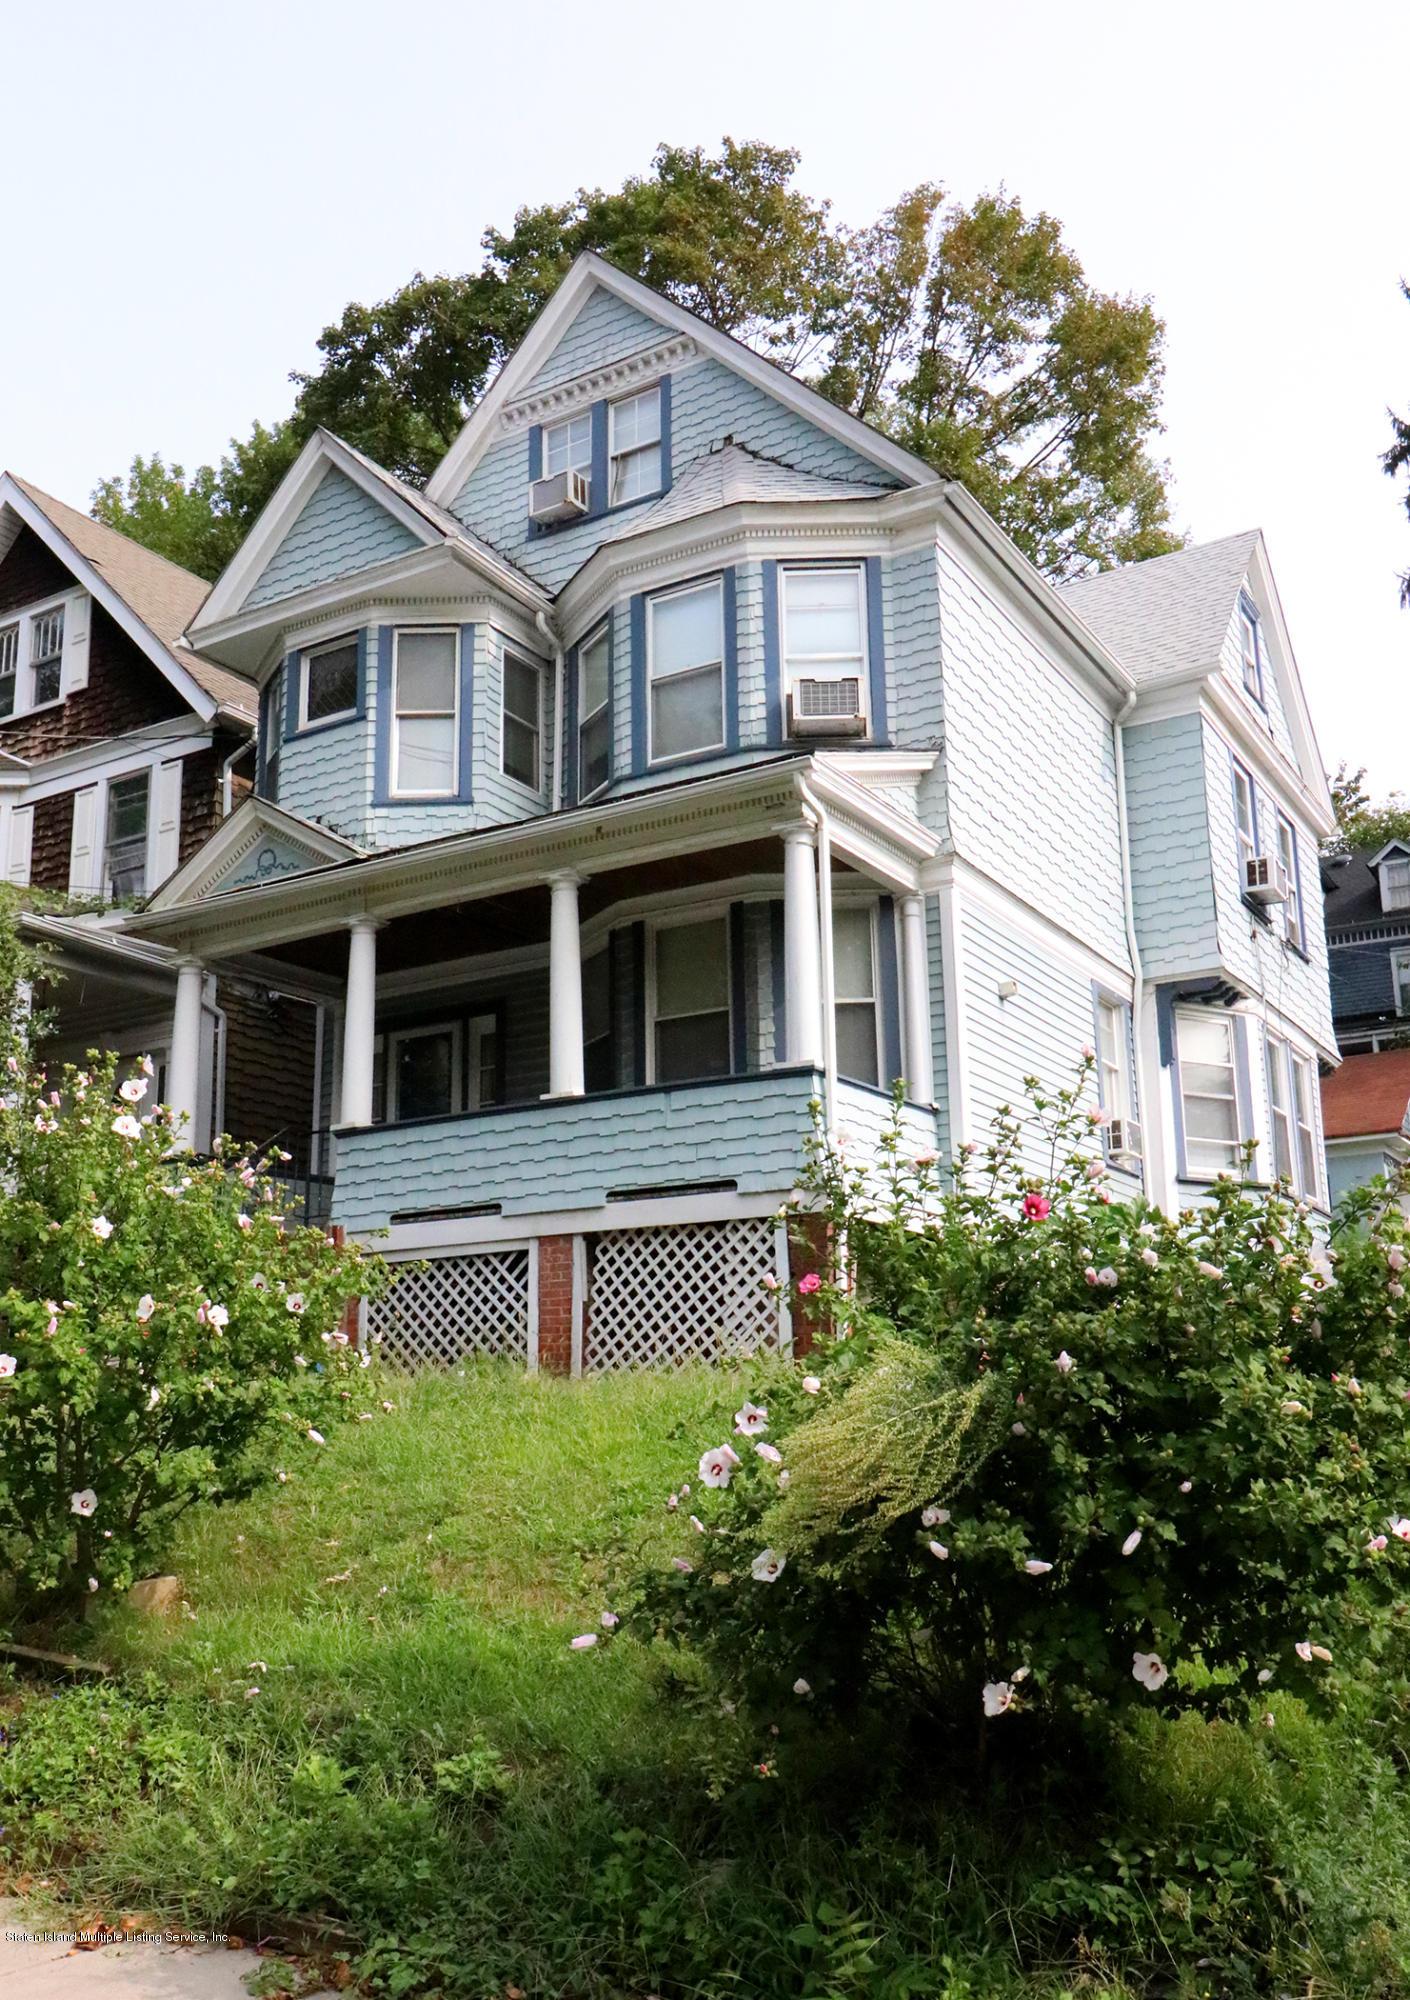 Two Family - Detached 175 Cebra Avenue  Staten Island, NY 10304, MLS-1140817-18